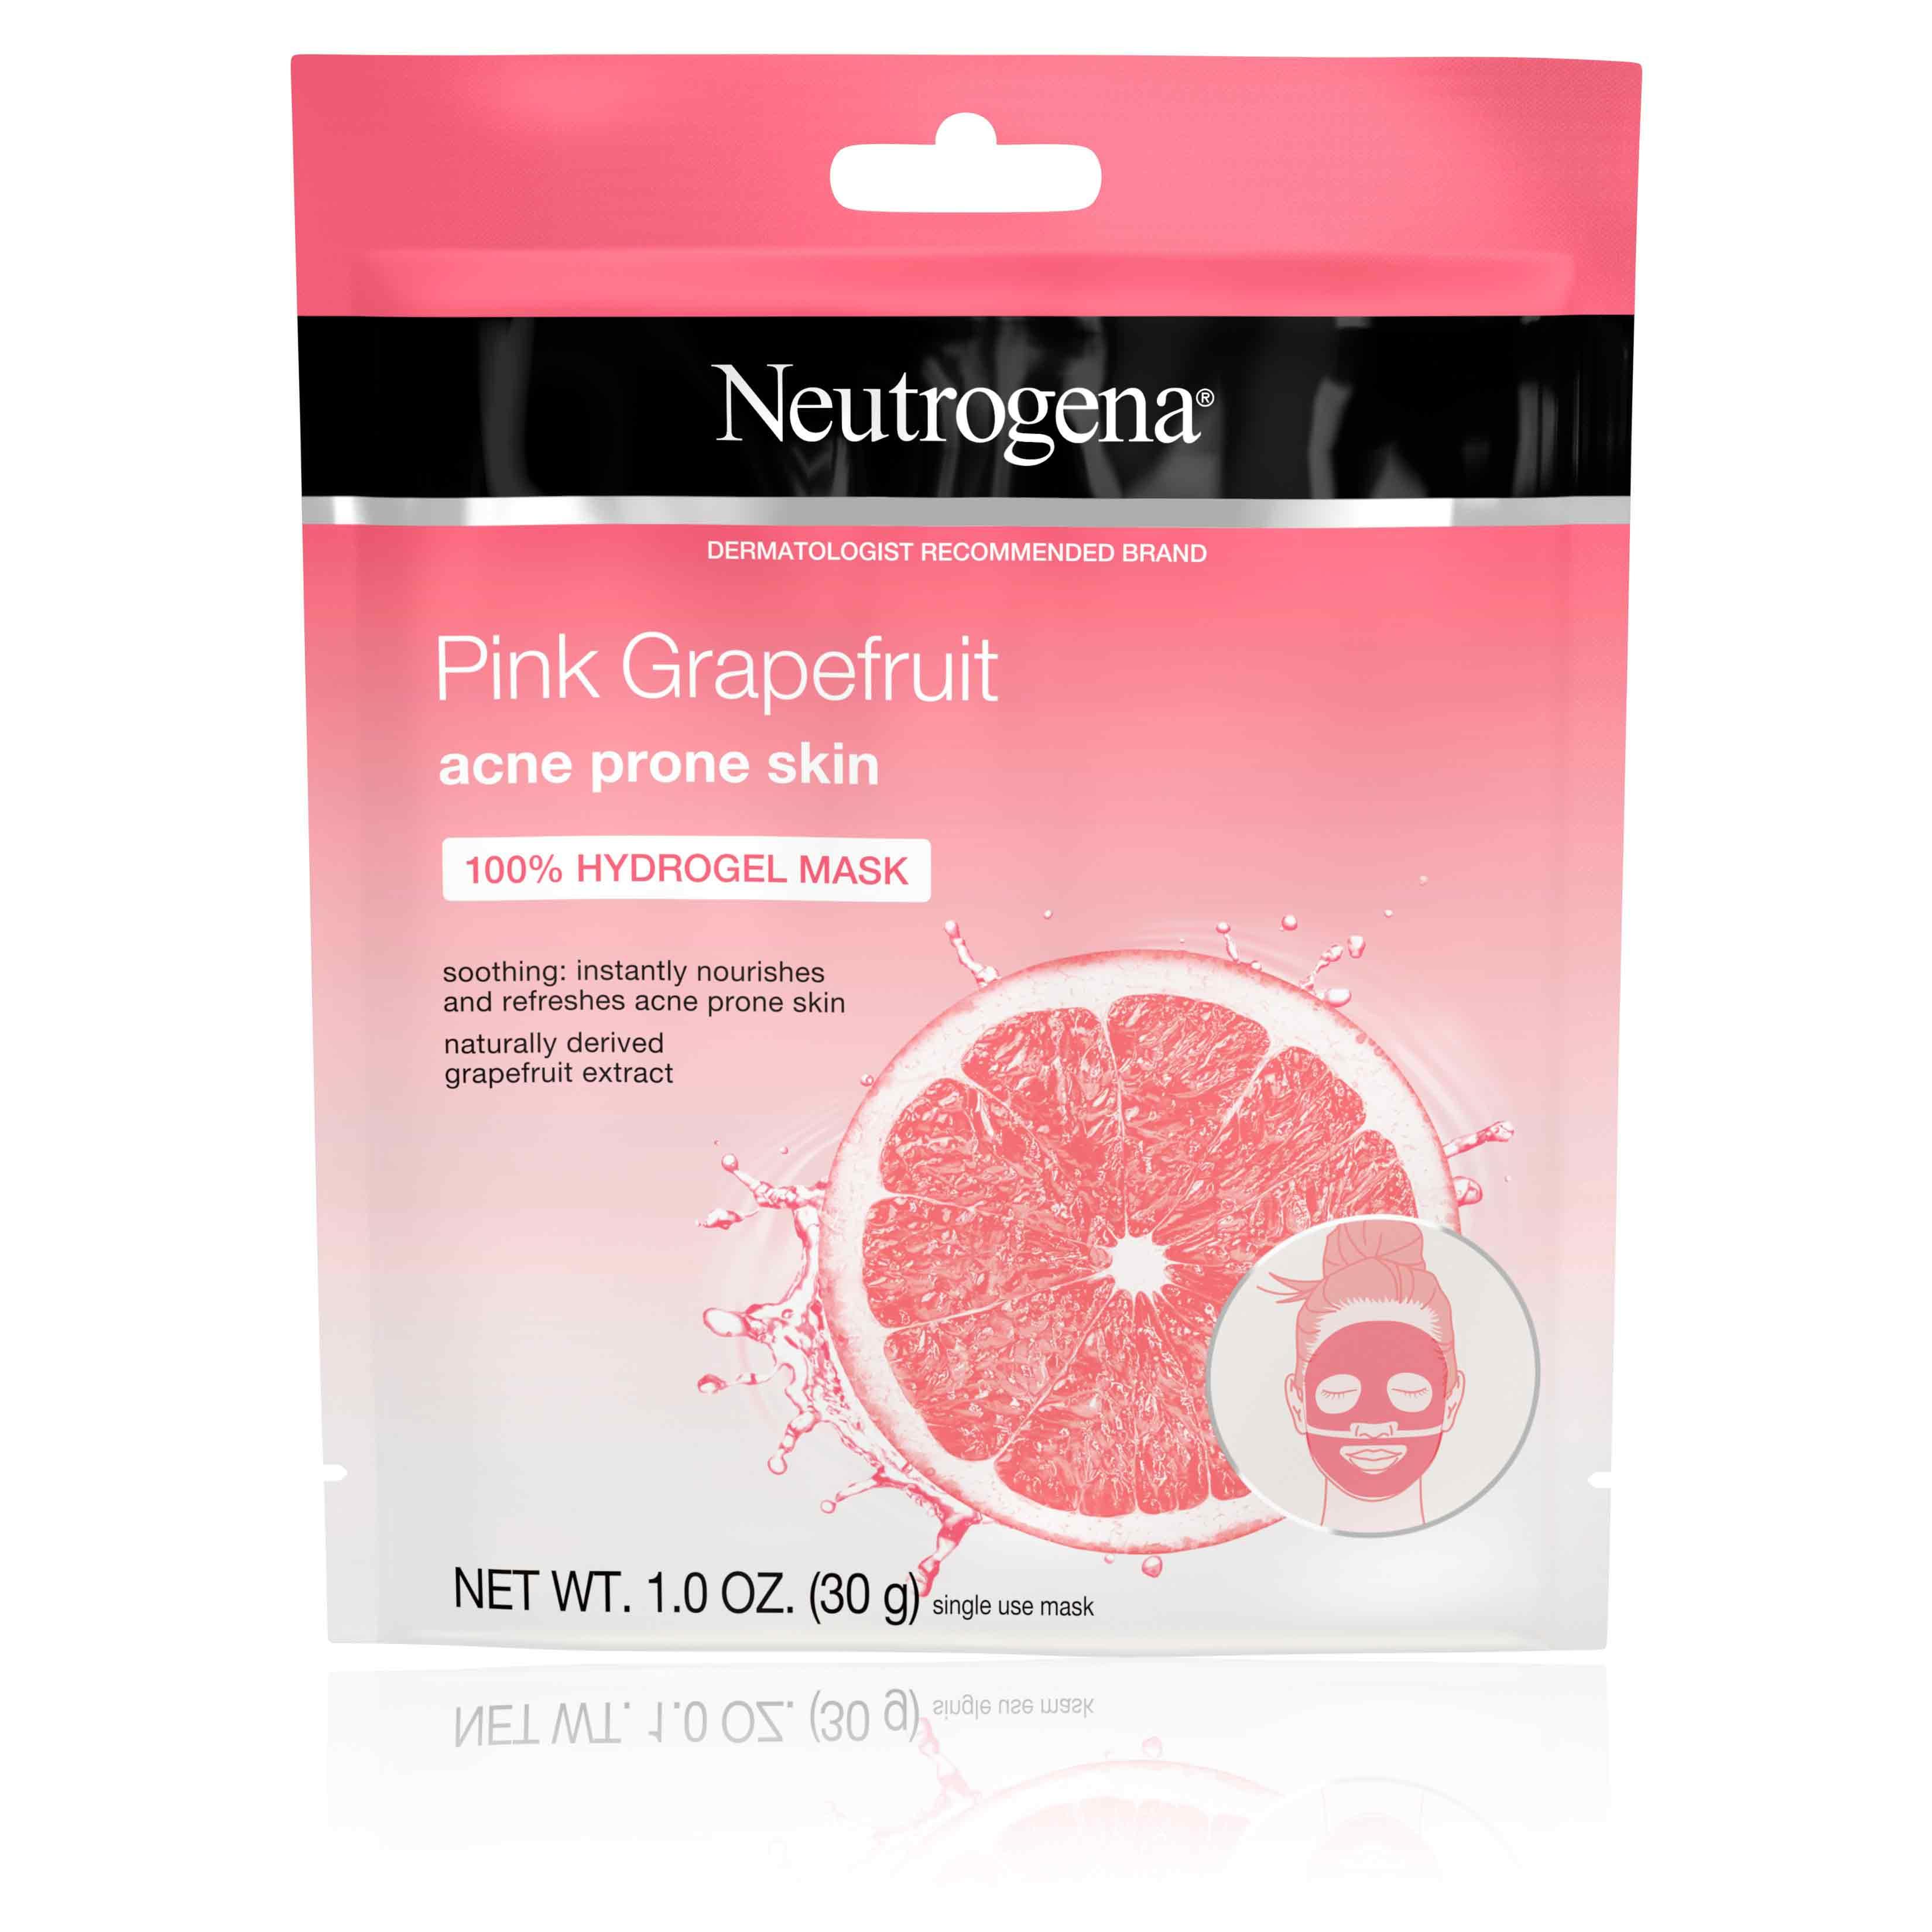 Neutrogena® Pink Grapefruit Acne Prone Skin 100% Hydrogel Mask